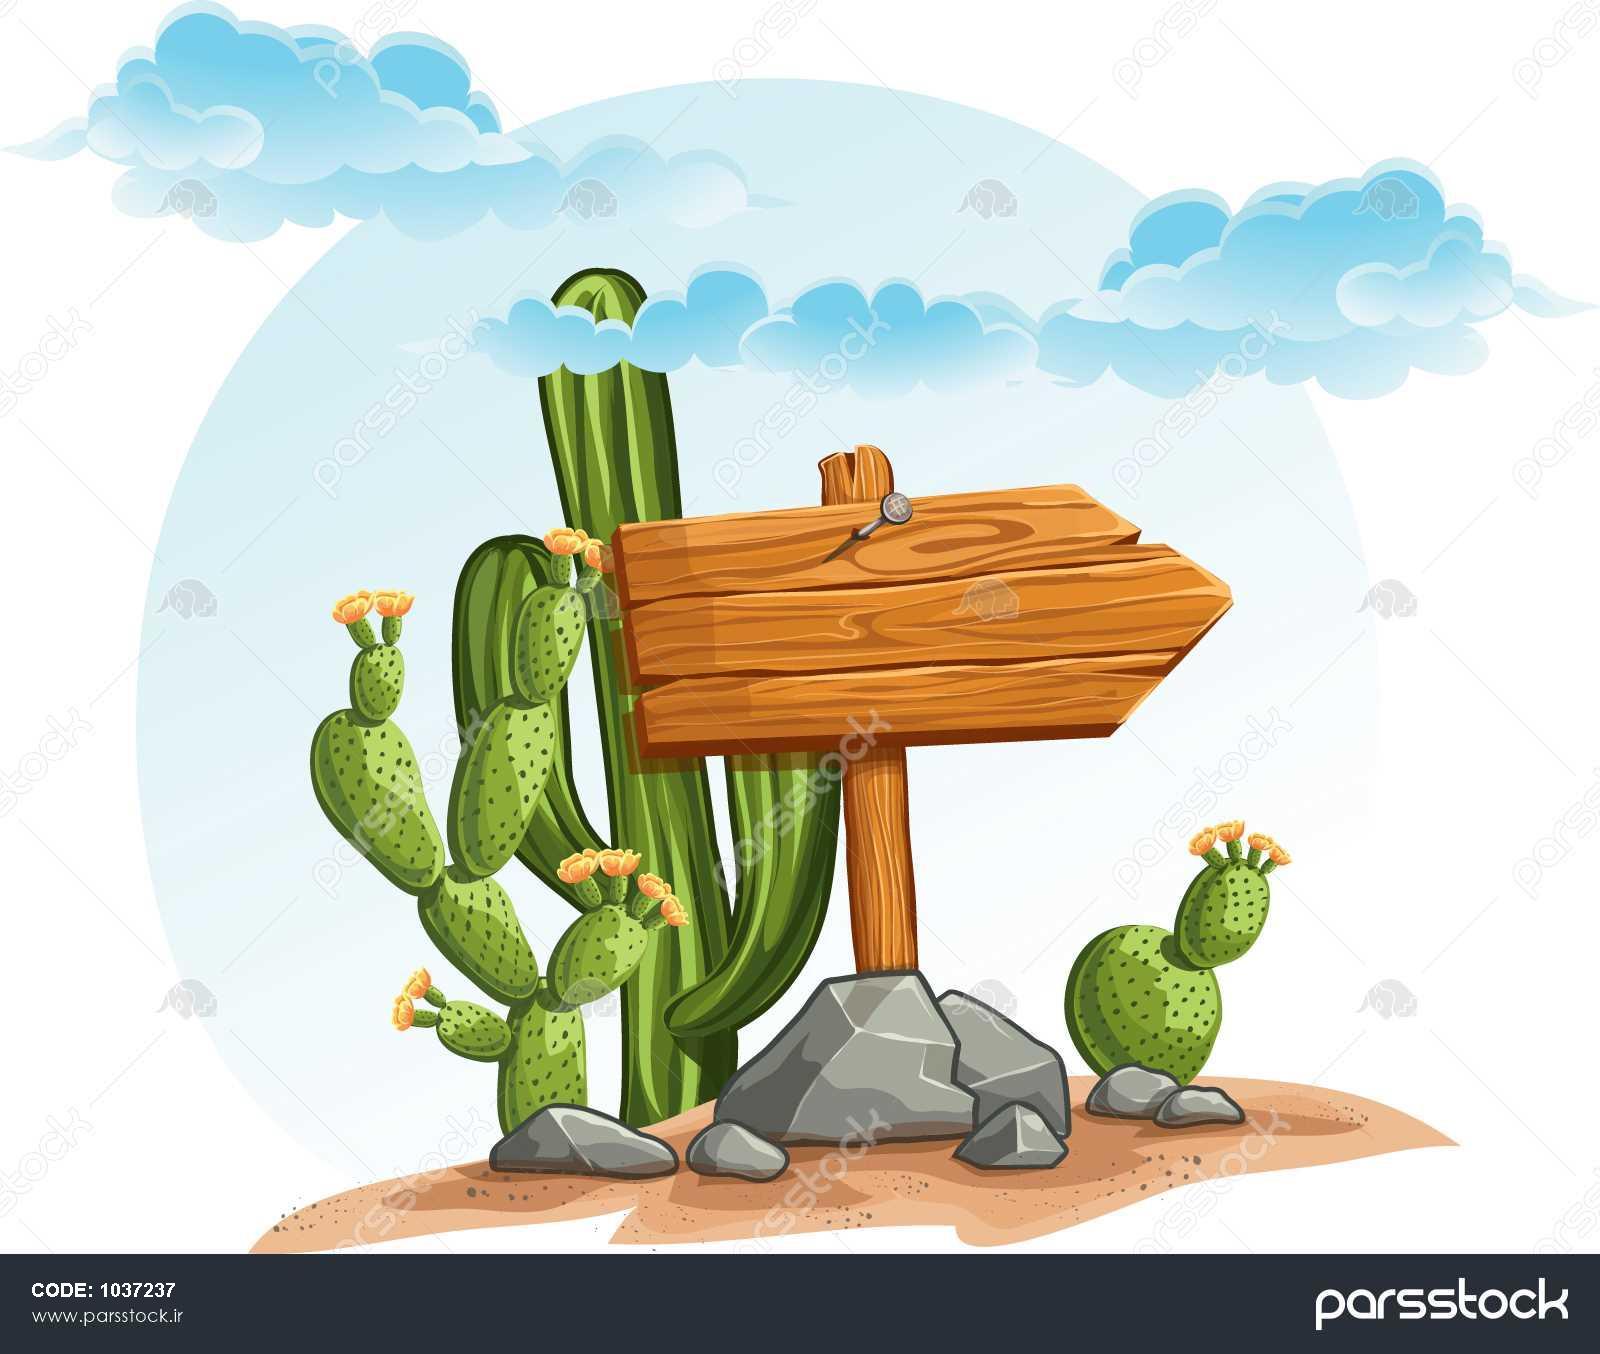 images of desert cactus flower